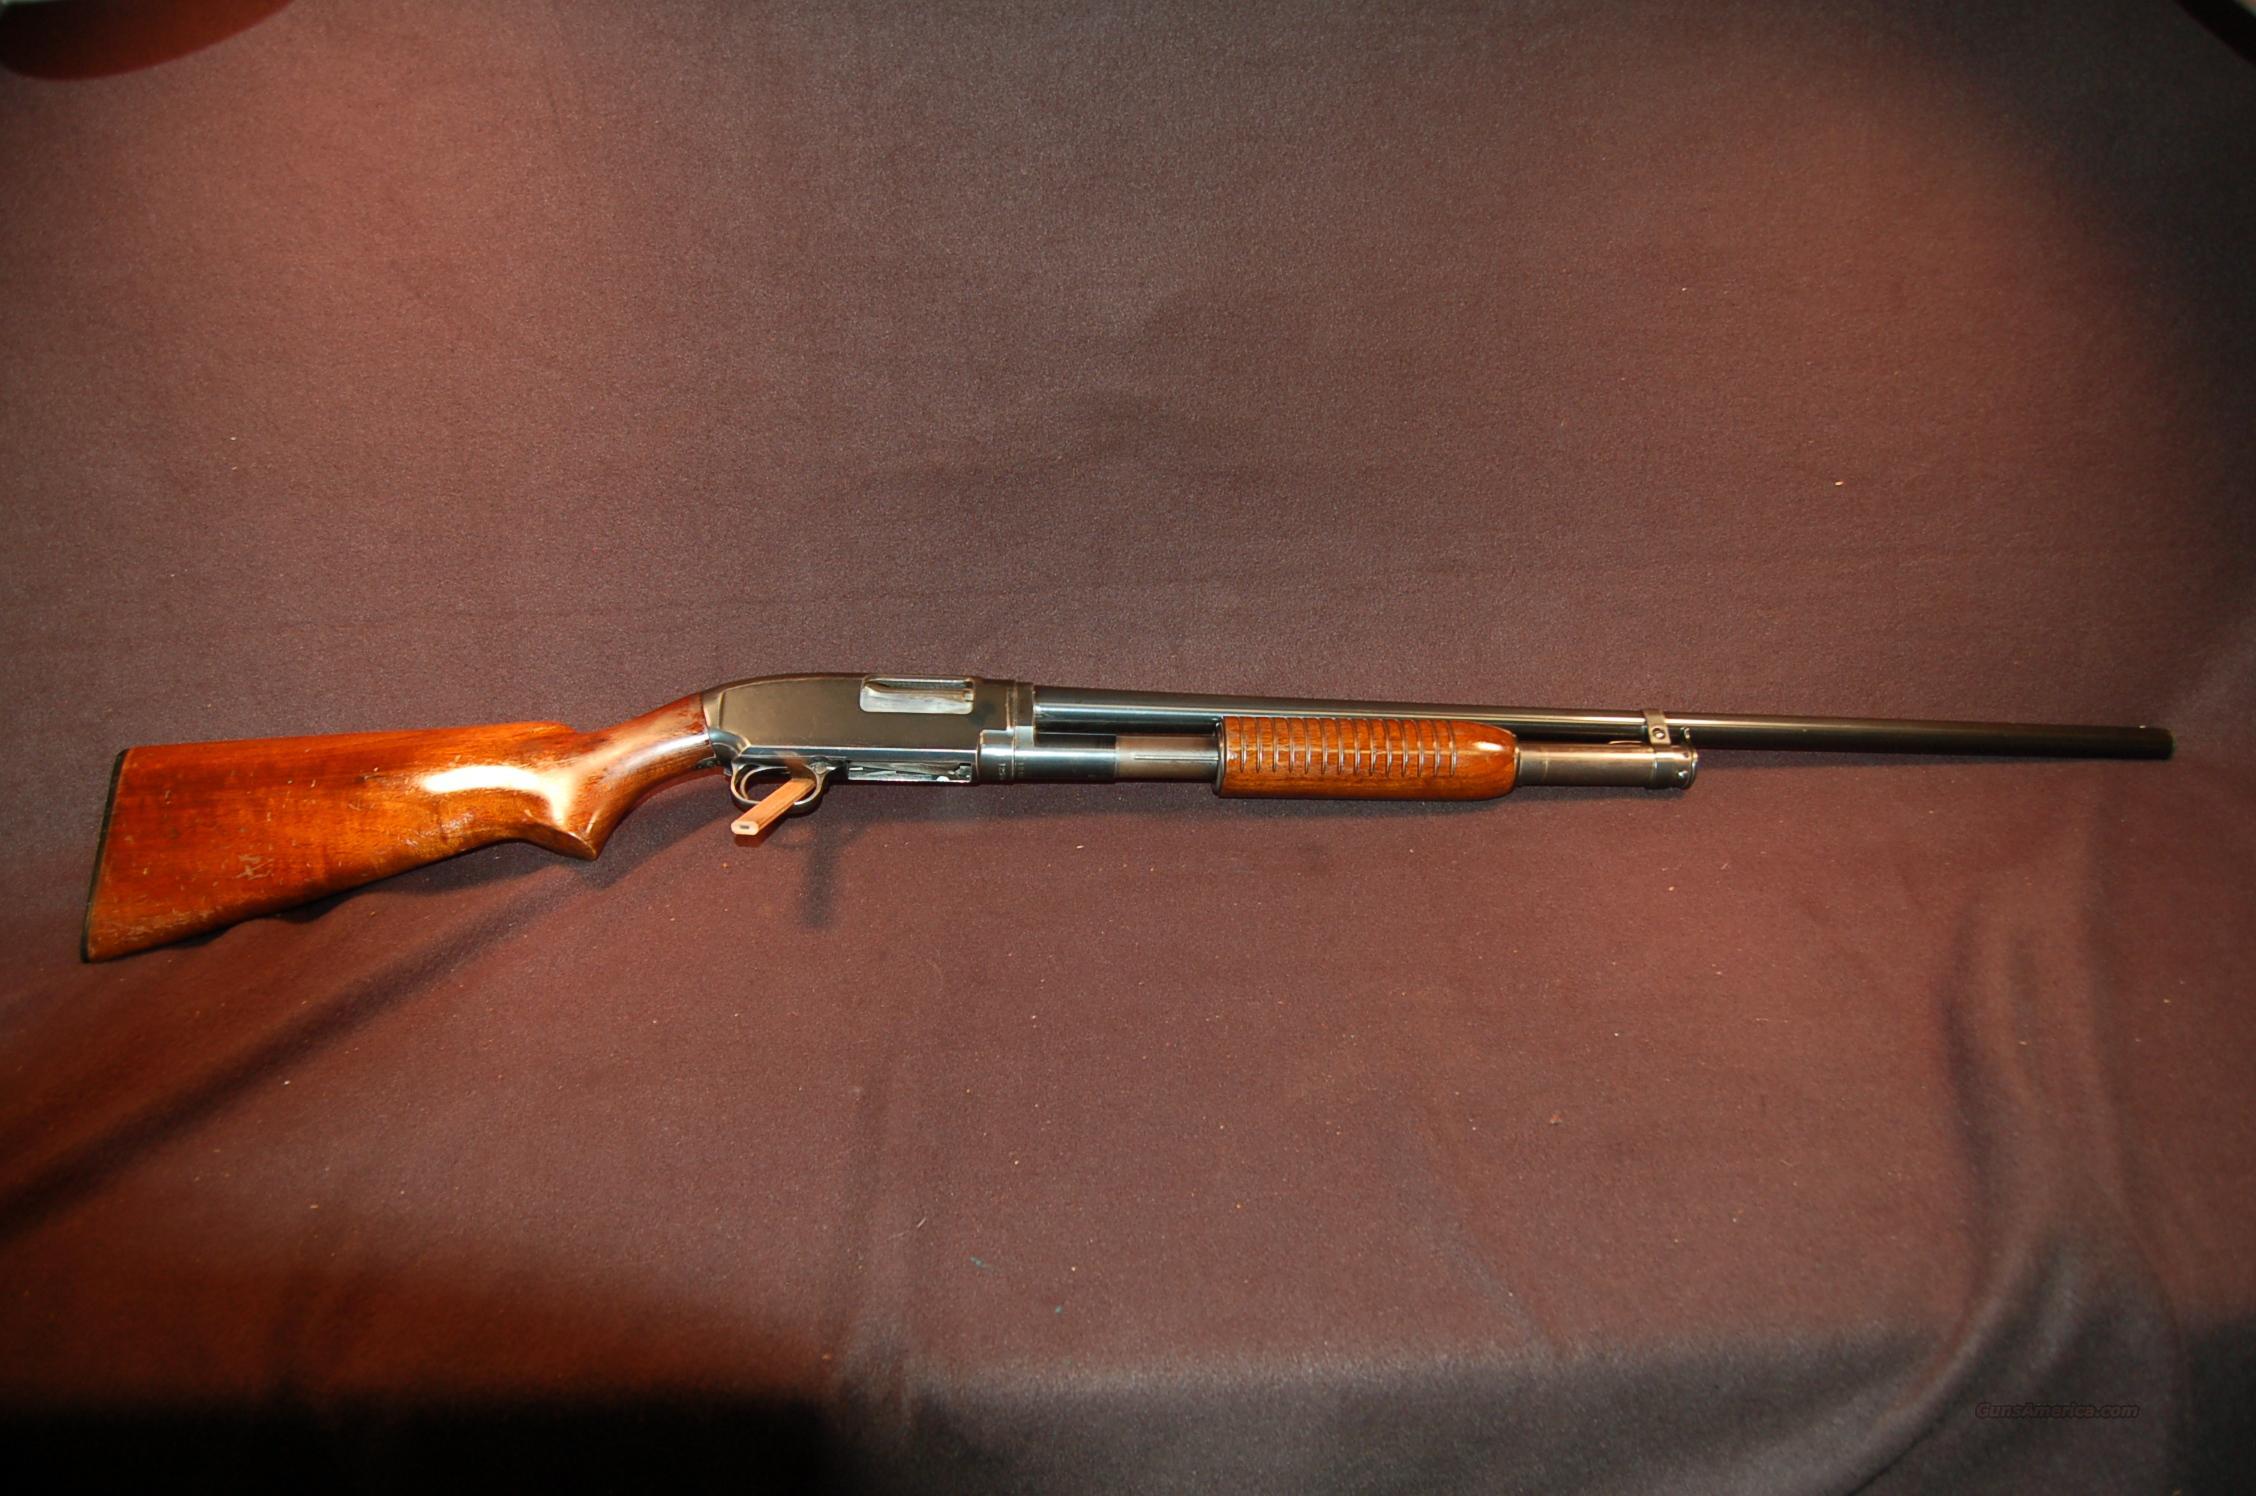 WIchester Model 12 12 ga. 1950  Guns > Shotguns > Winchester Shotguns - Modern > Pump Action > Hunting